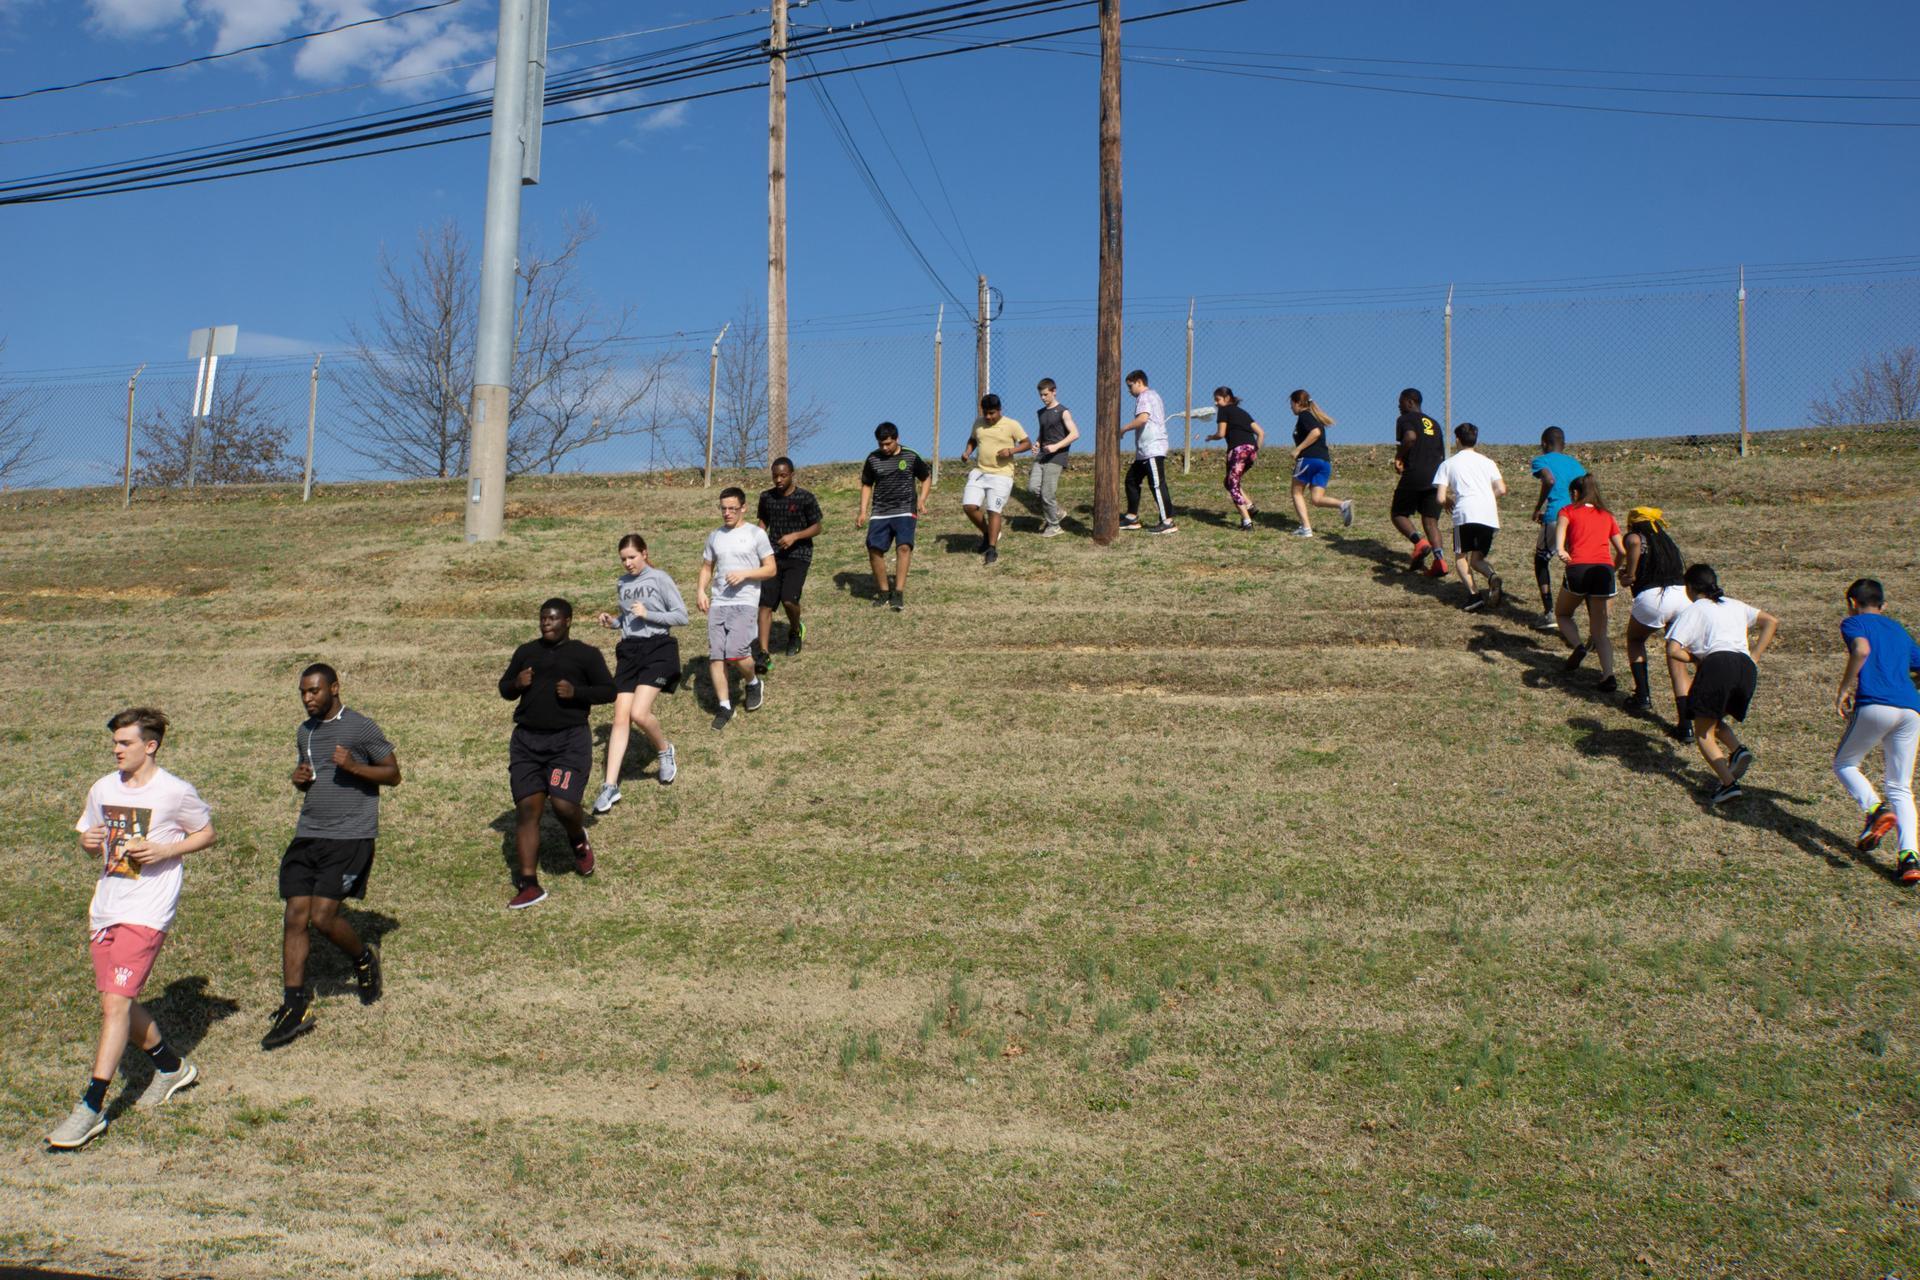 Bulldog JROTC Physical Training Run